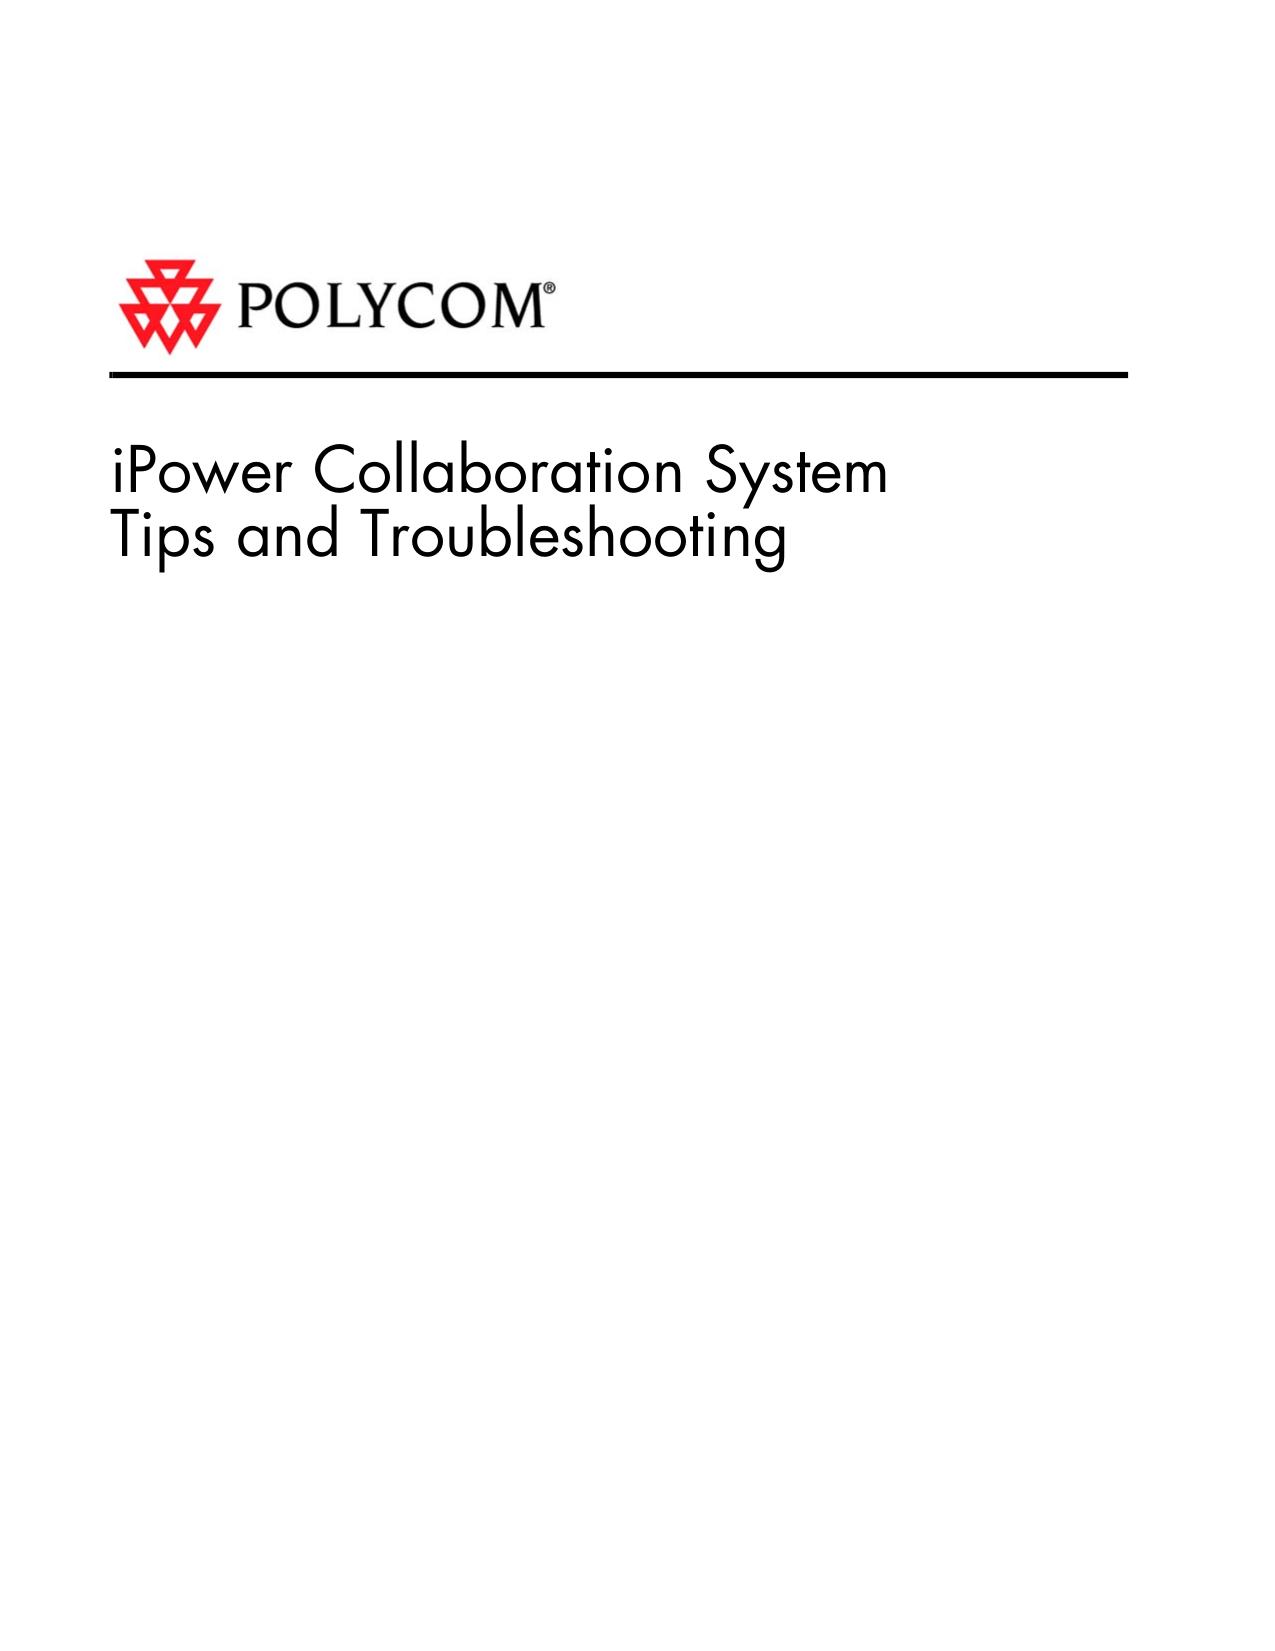 iso 9000 pdf free download